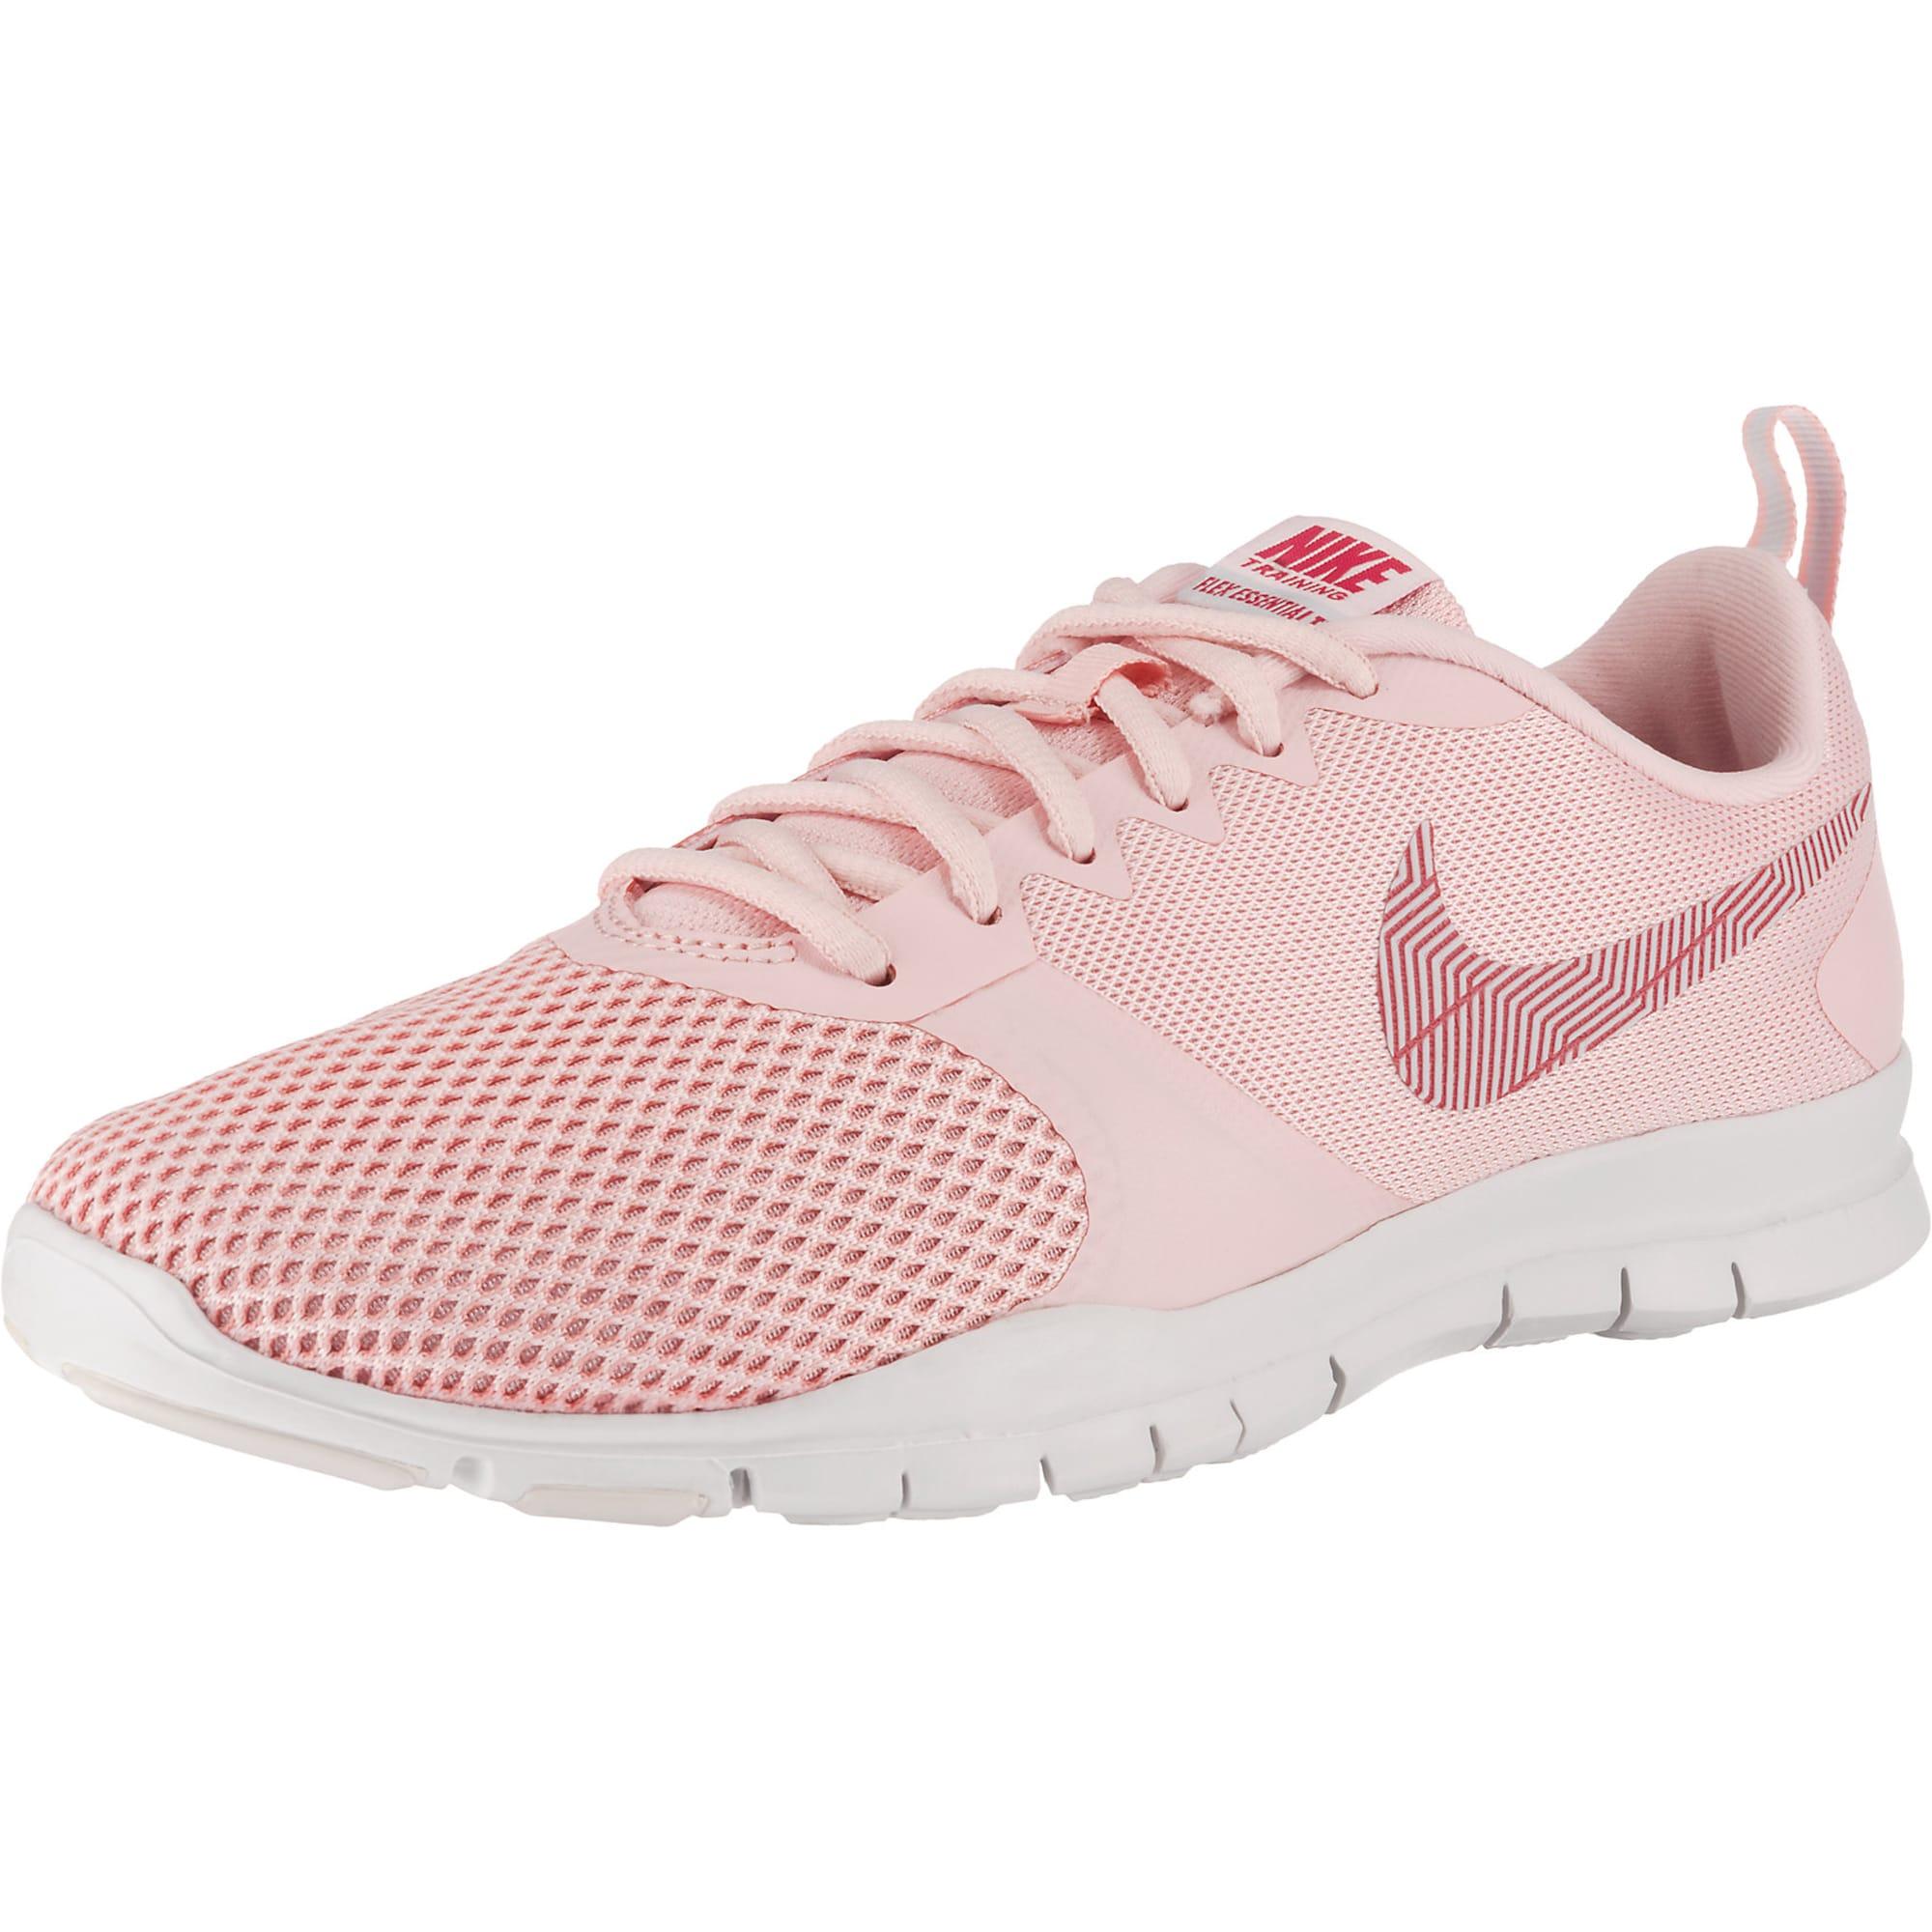 Fitnessschuhe 'Flex Essential TR' | Schuhe > Sportschuhe > Fitnessschuhe | Nike